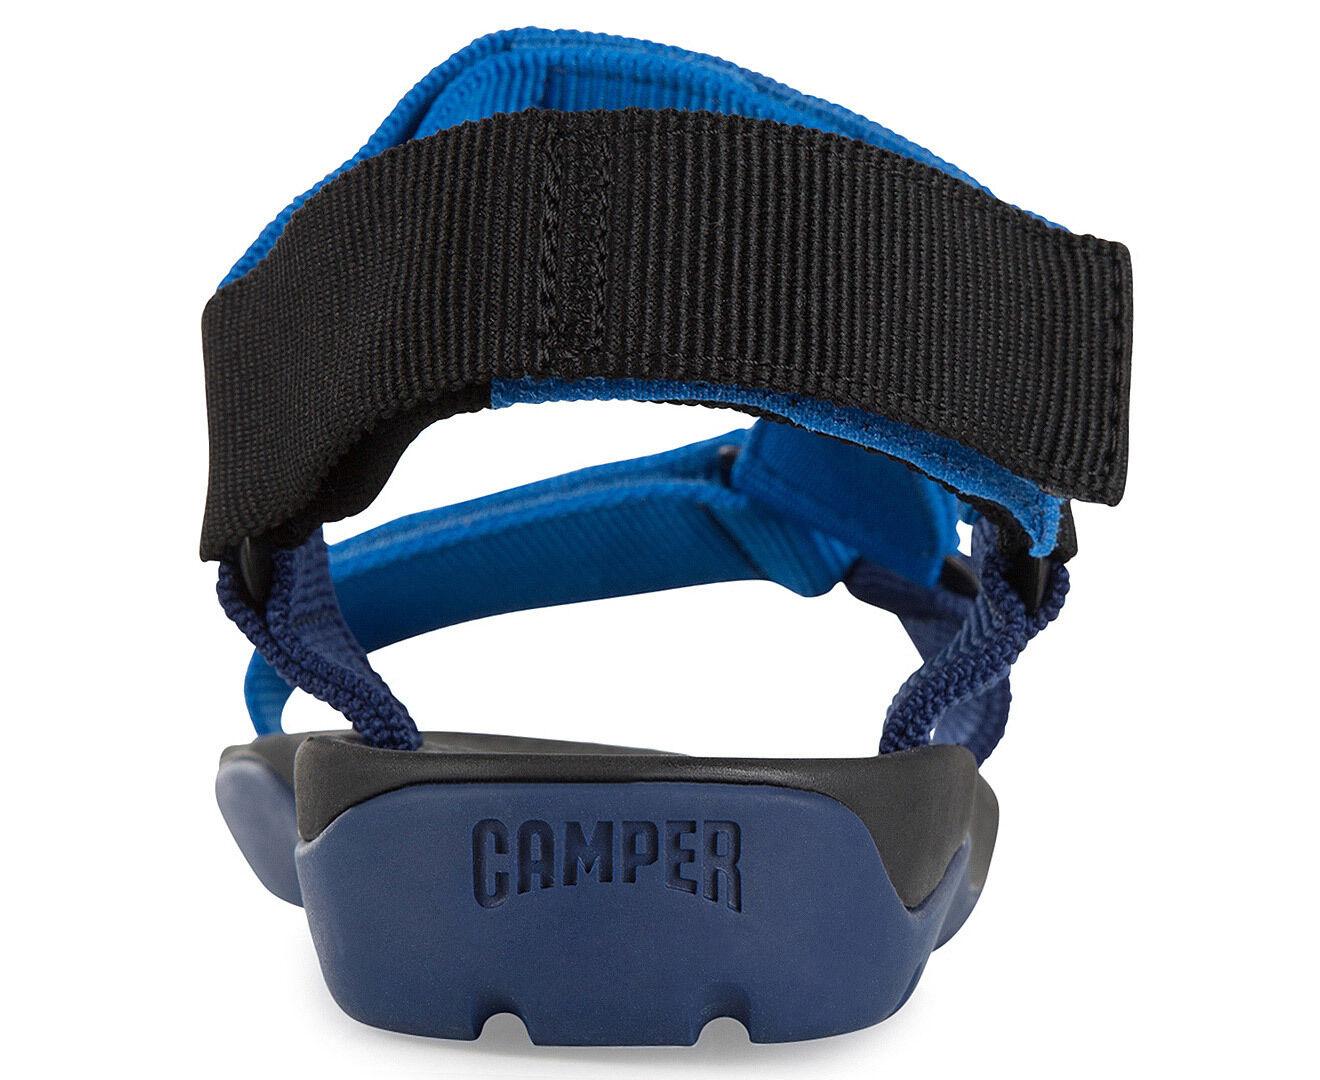 CAMPER MENS MATCH SHOE - BLUE & BLACK